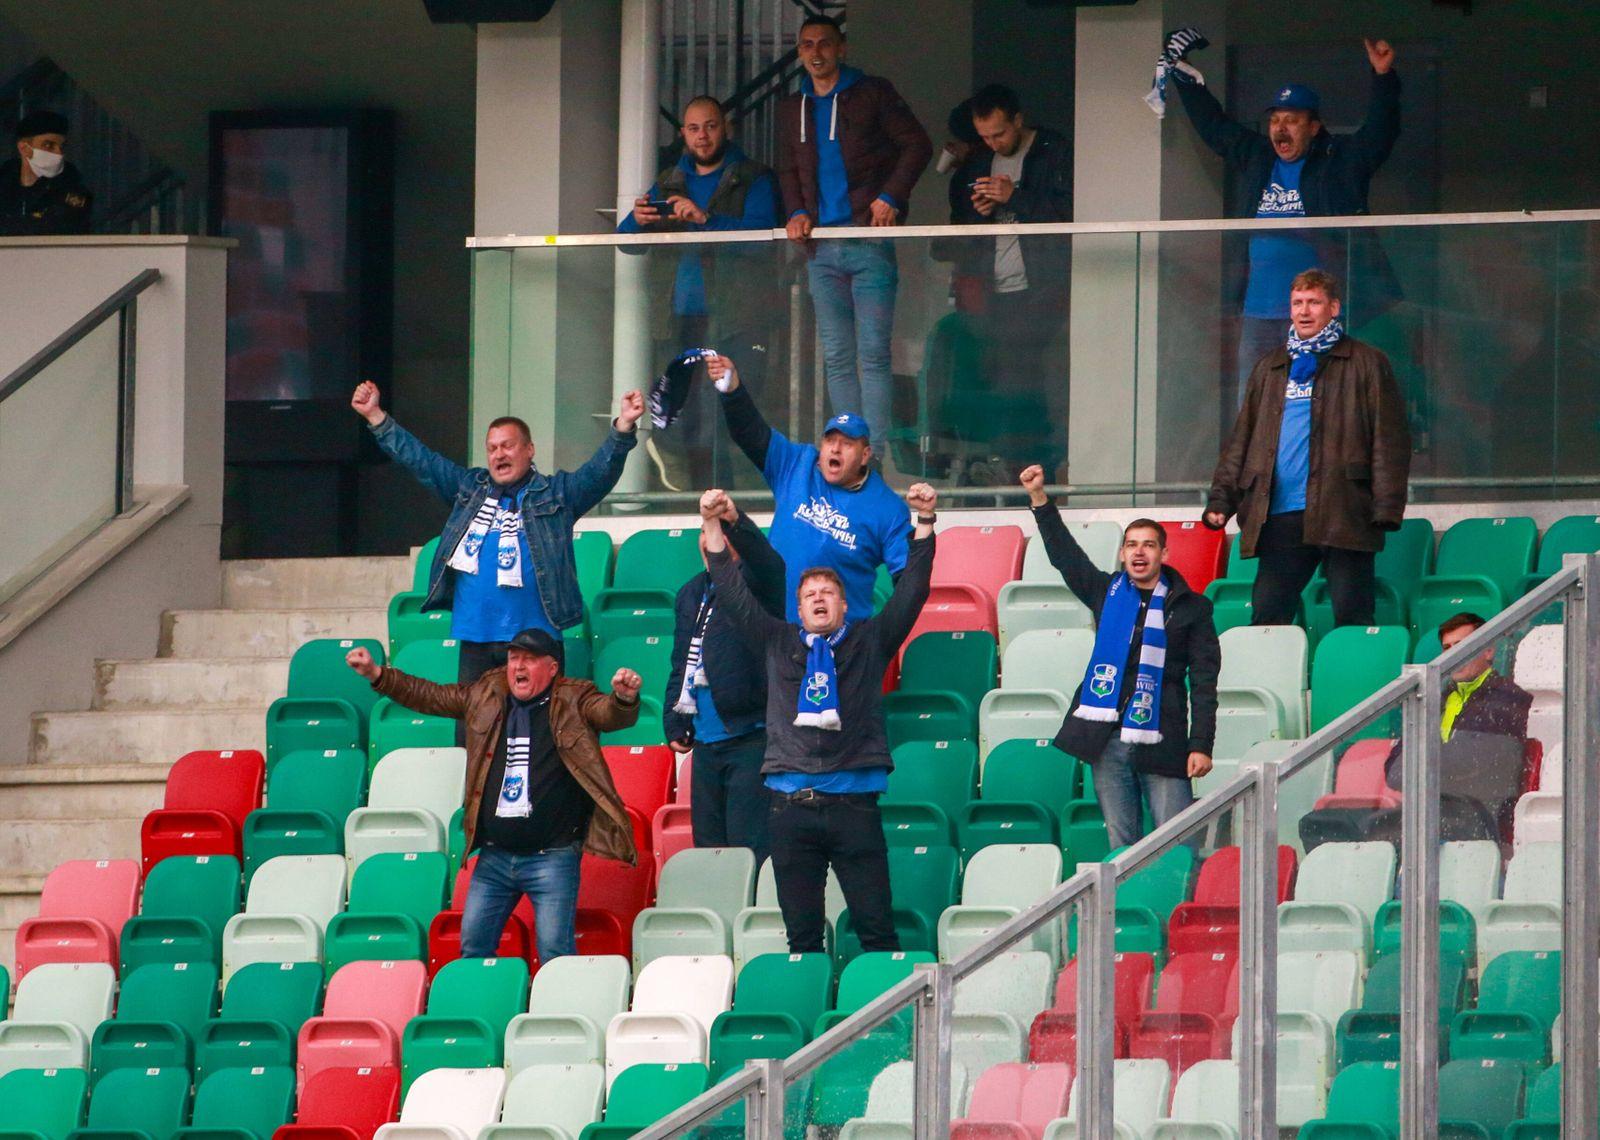 02.05.2020 MINSK, BELARUS. Fans watch a 2020 Belarusian Premier League Round 7 football match between FC Dinamo Minsk a